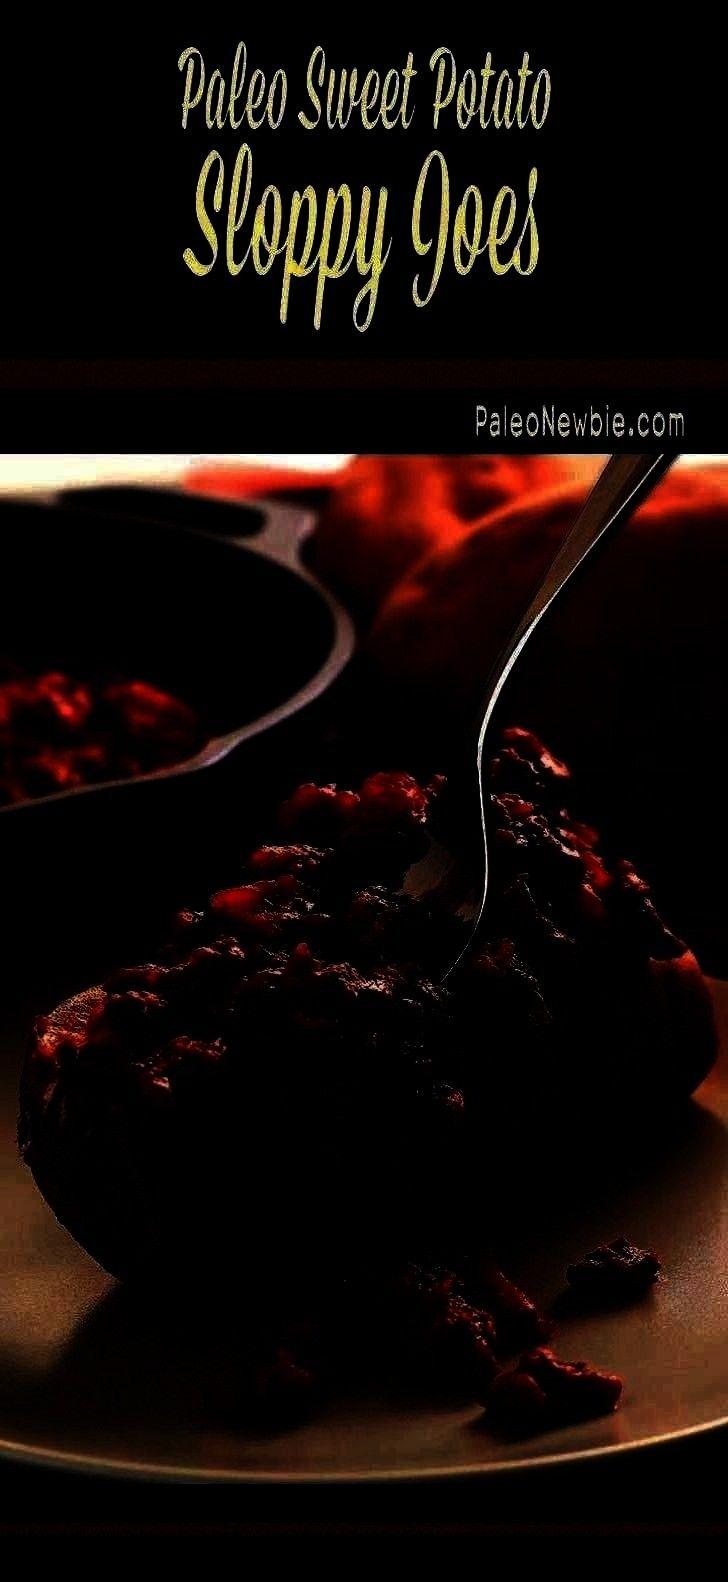 Paleo Diet For Weight Loss except Die...,  Paleo Diet Food List For Indian few Strict Paleo Diet Fo